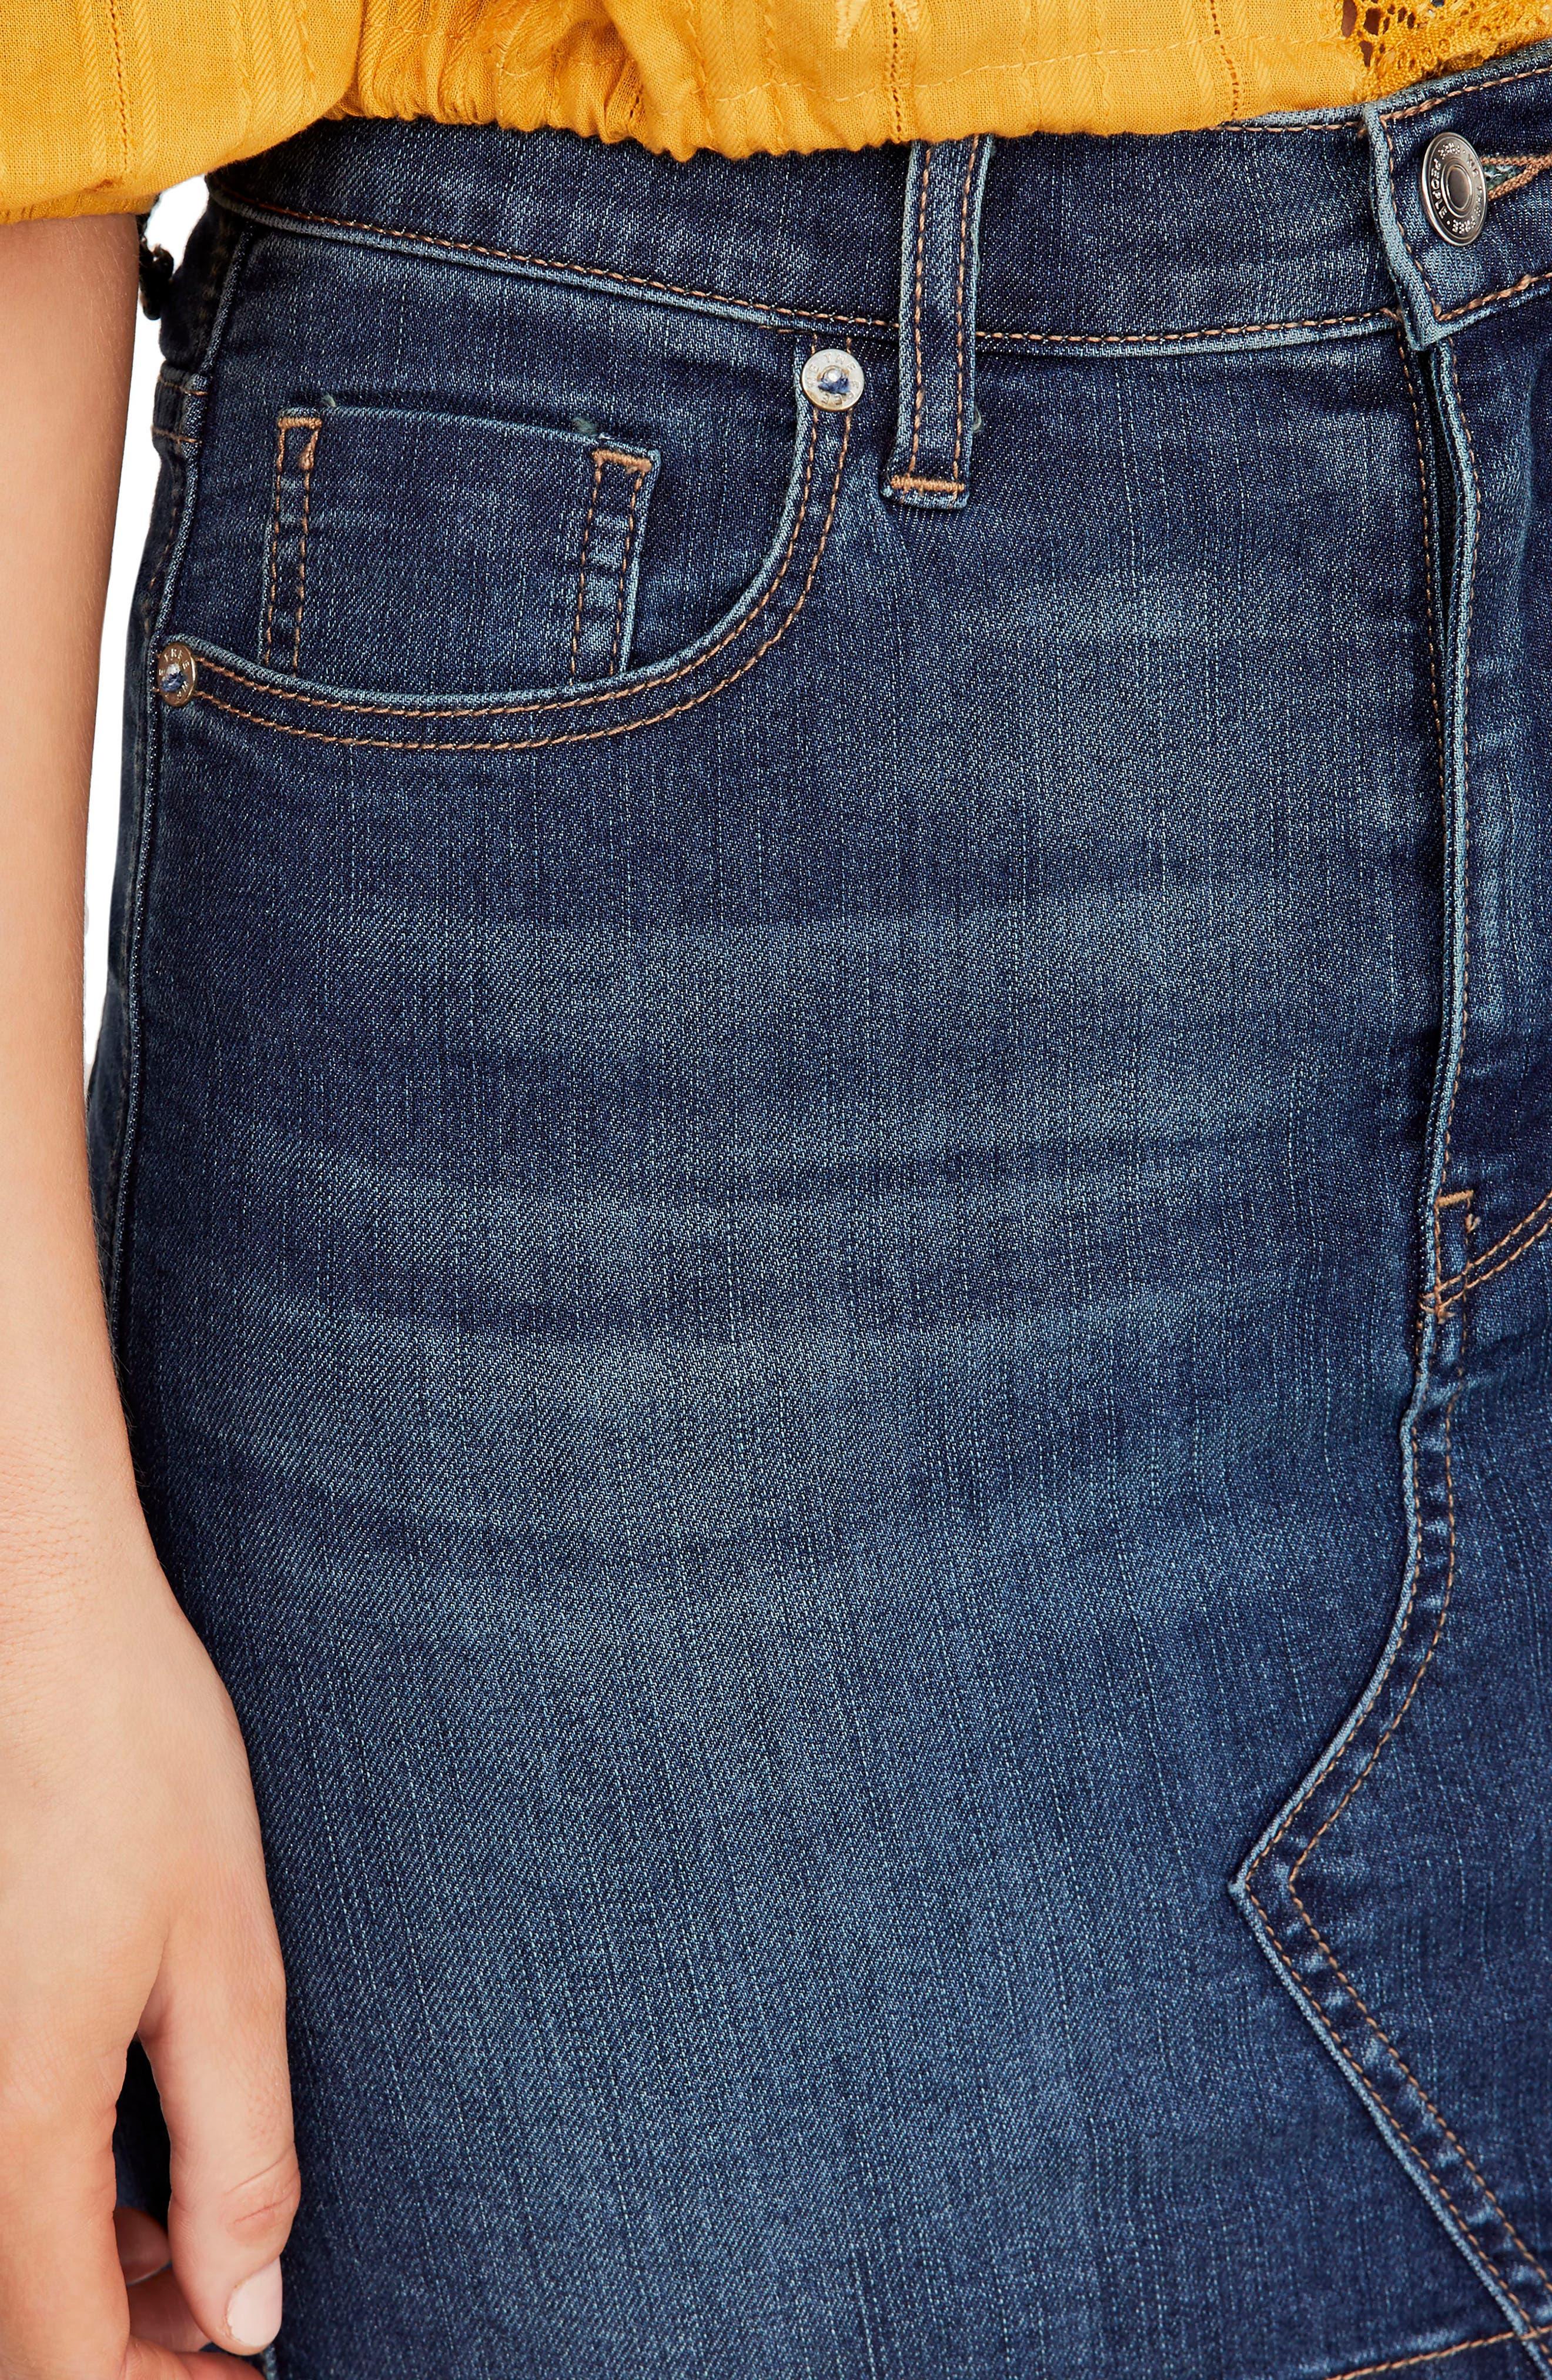 Teagan Denim Miniskirt,                             Alternate thumbnail 4, color,                             DARK DENIM